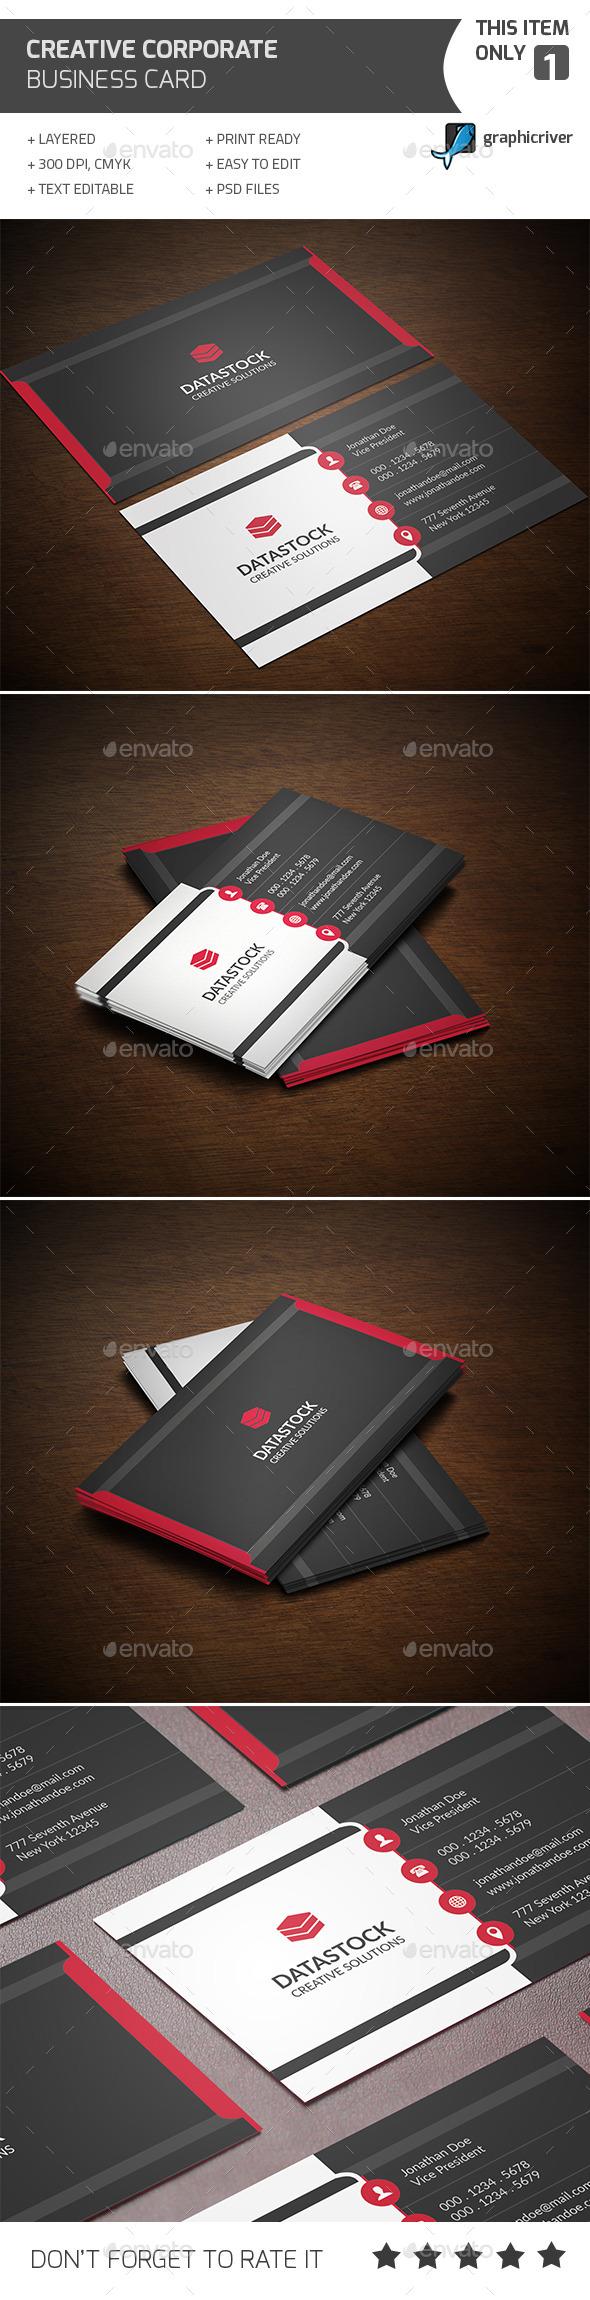 Creative Corporate Business Card - Corporate Business Cards